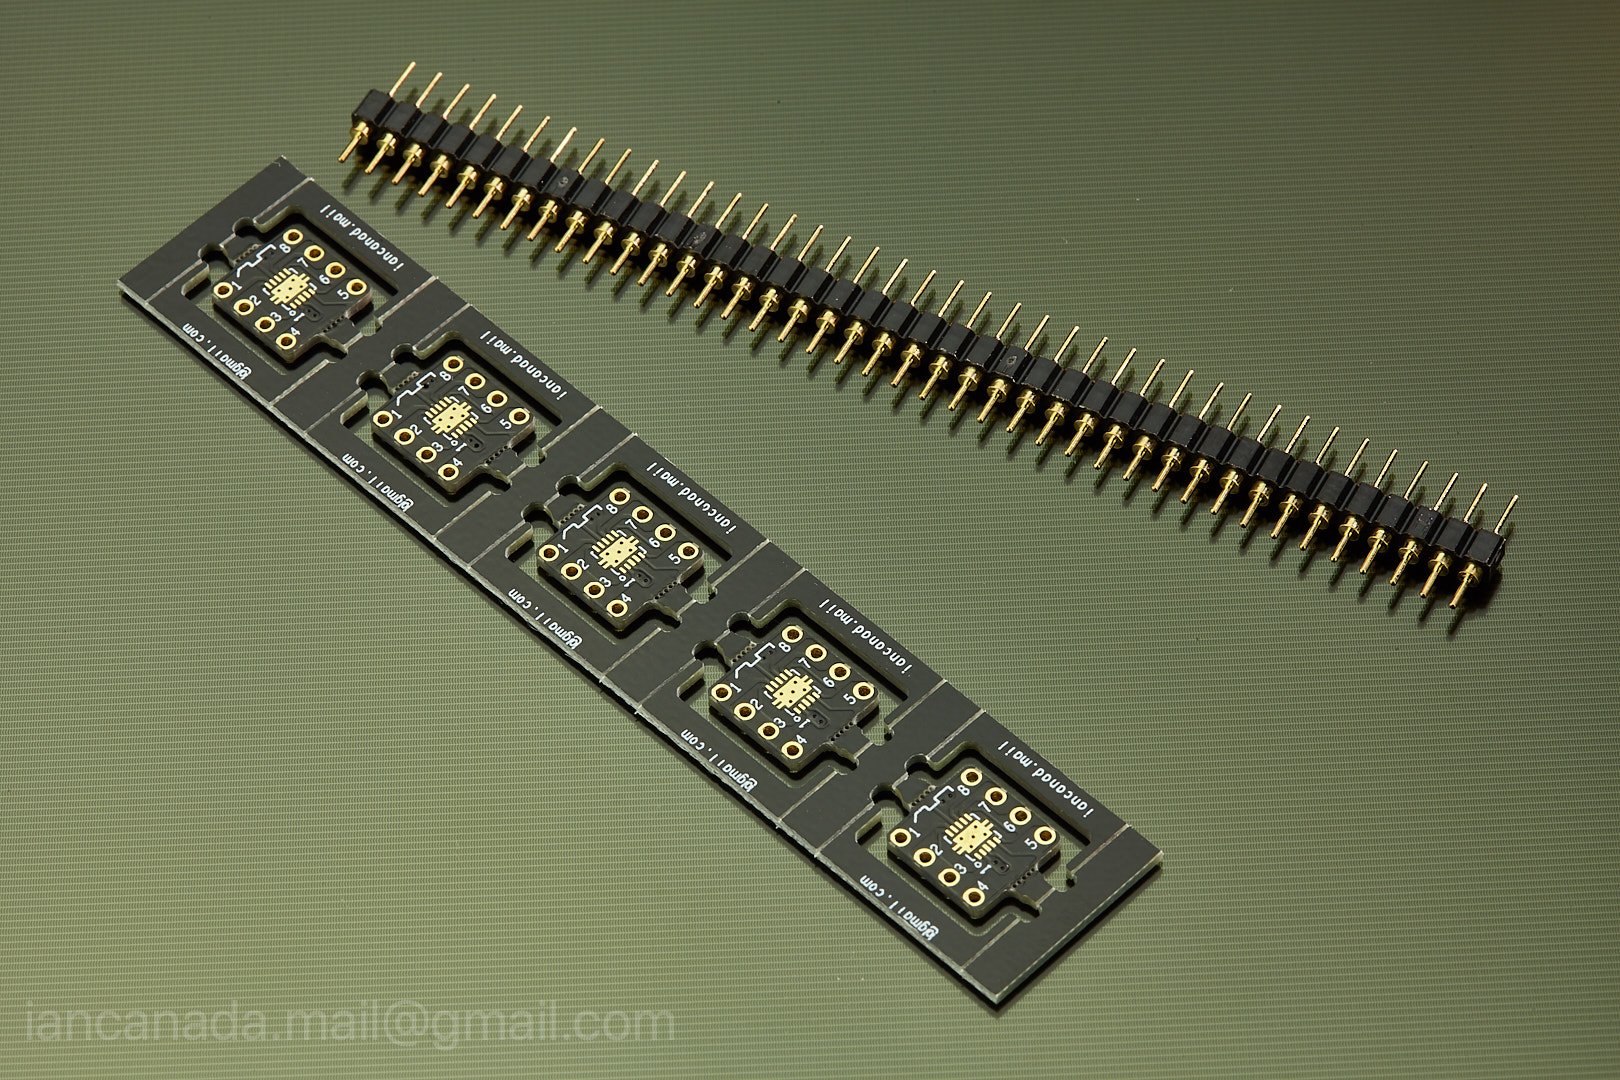 OPA1622 adapter